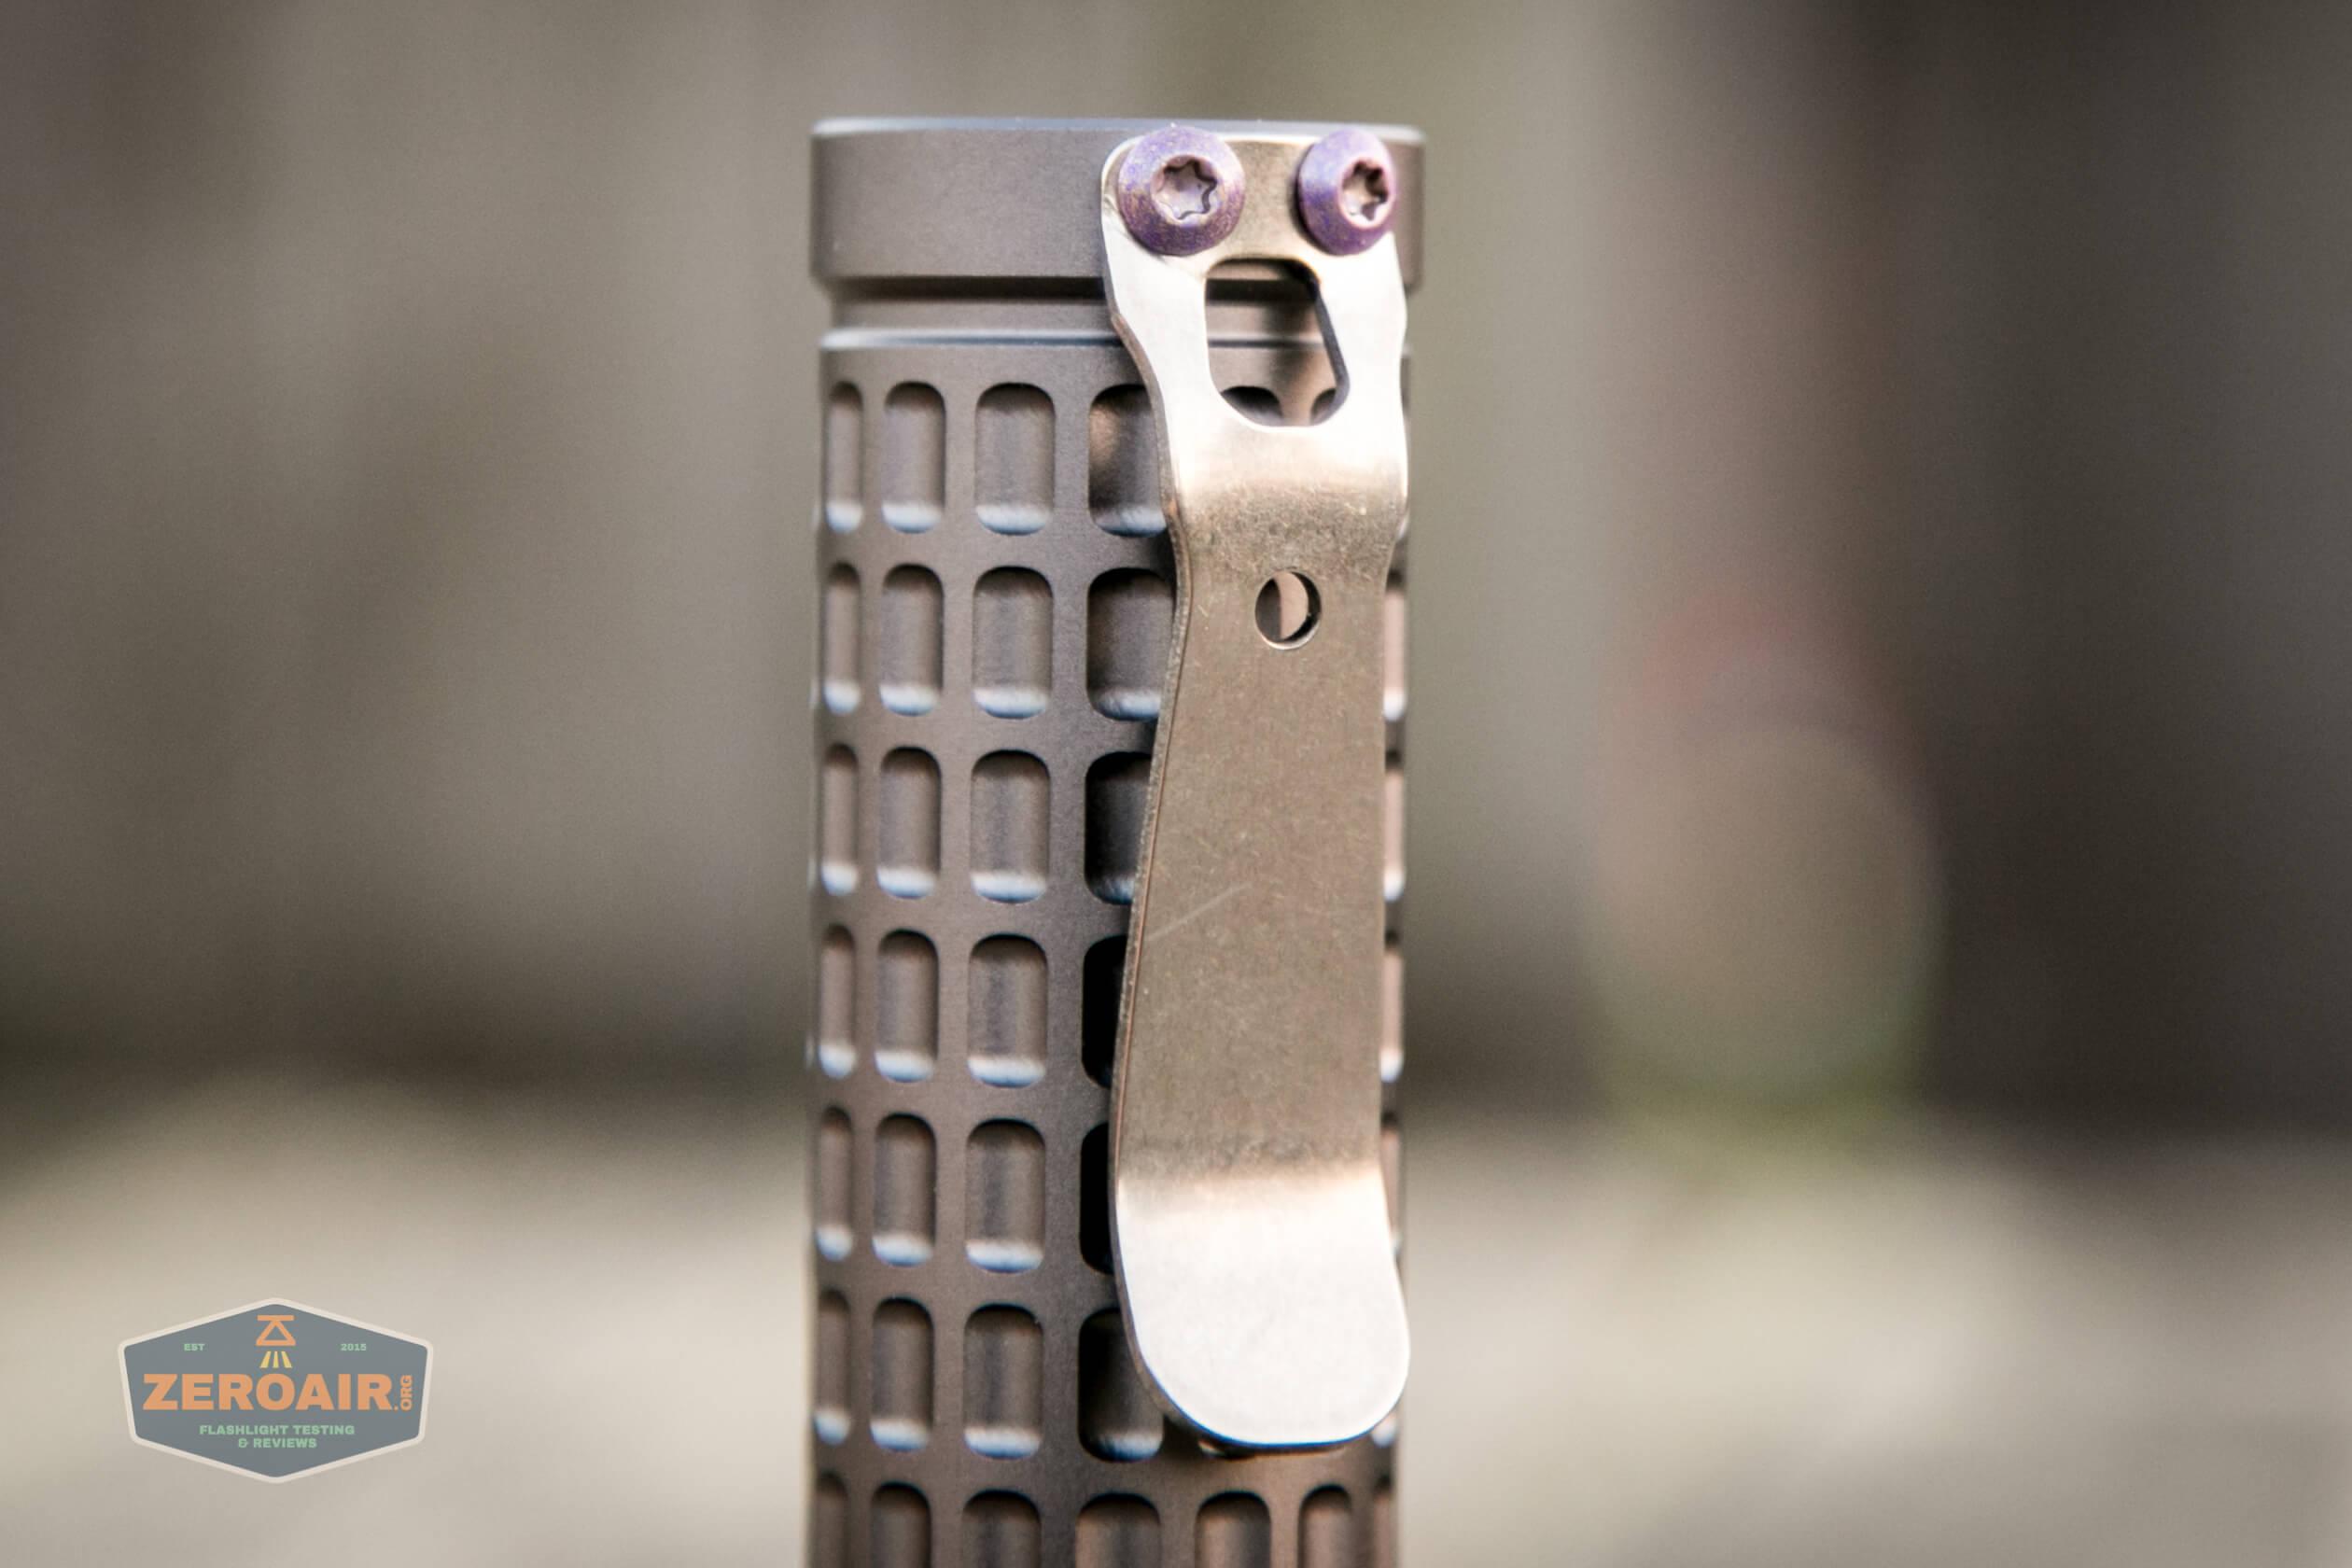 countycomm reylight 21700 quad emitter flashlight pocket clip